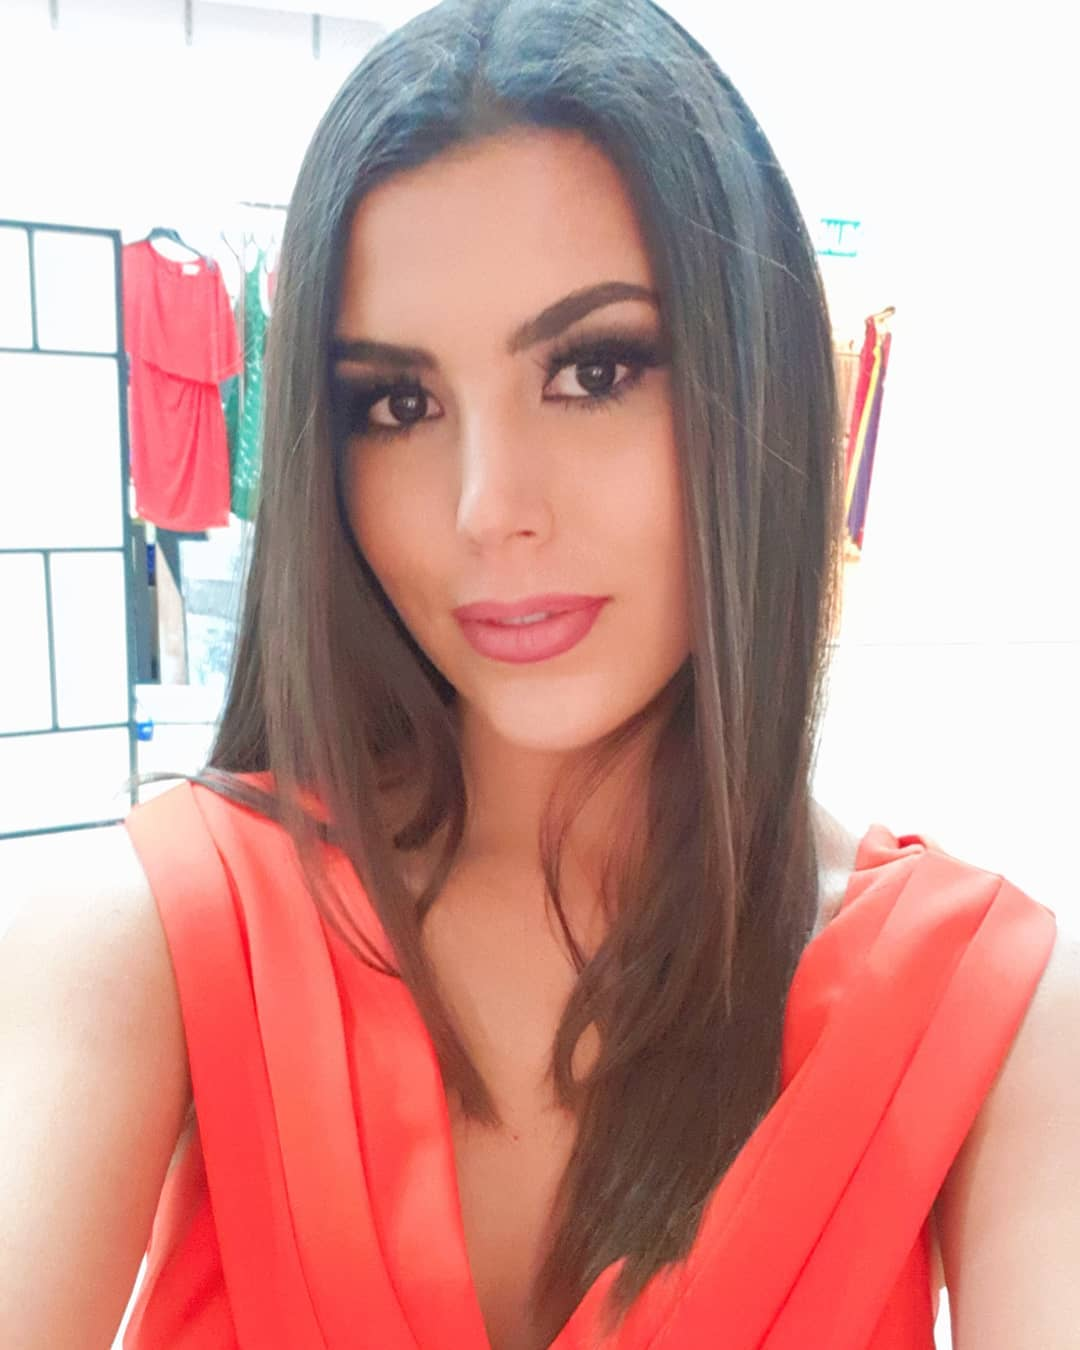 sofia del prado, top 10 de miss universe 2017/reyna hispanoamericana 2015/miss charm spain 2021. - Página 14 Sofiad18